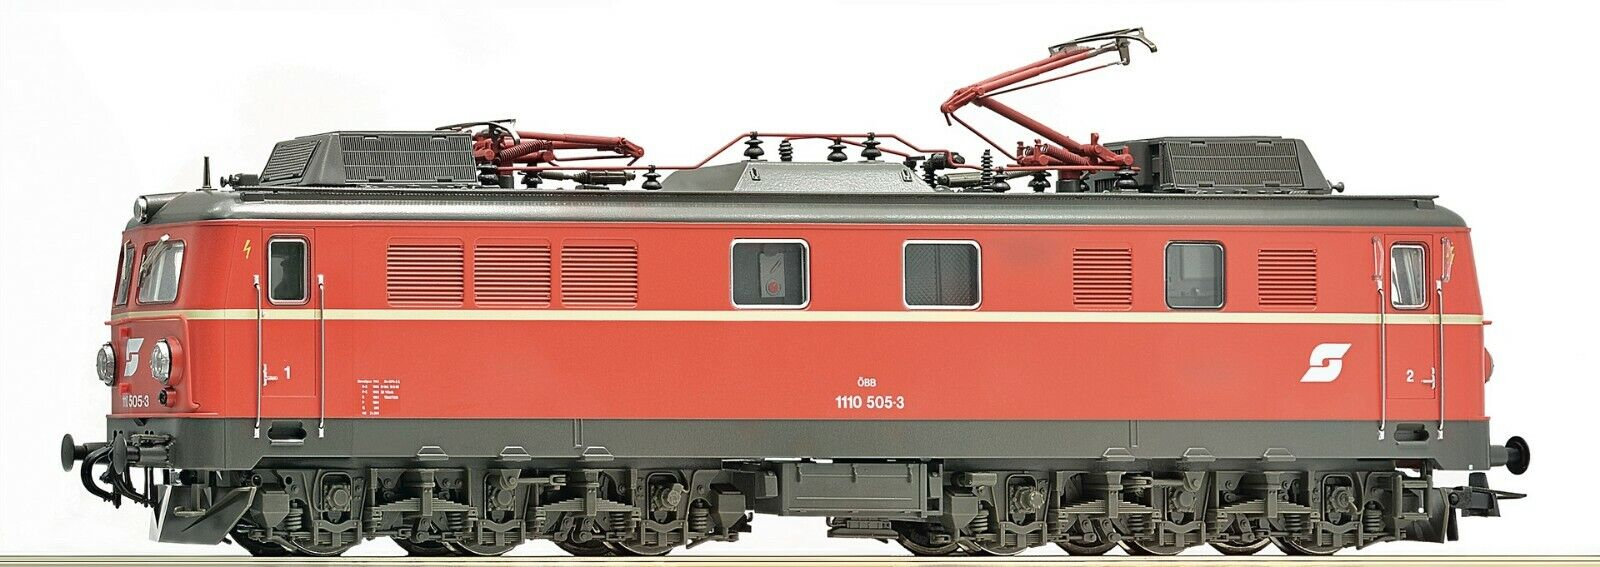 Roco HO scale Electric locomotive class 1110.5 OBB